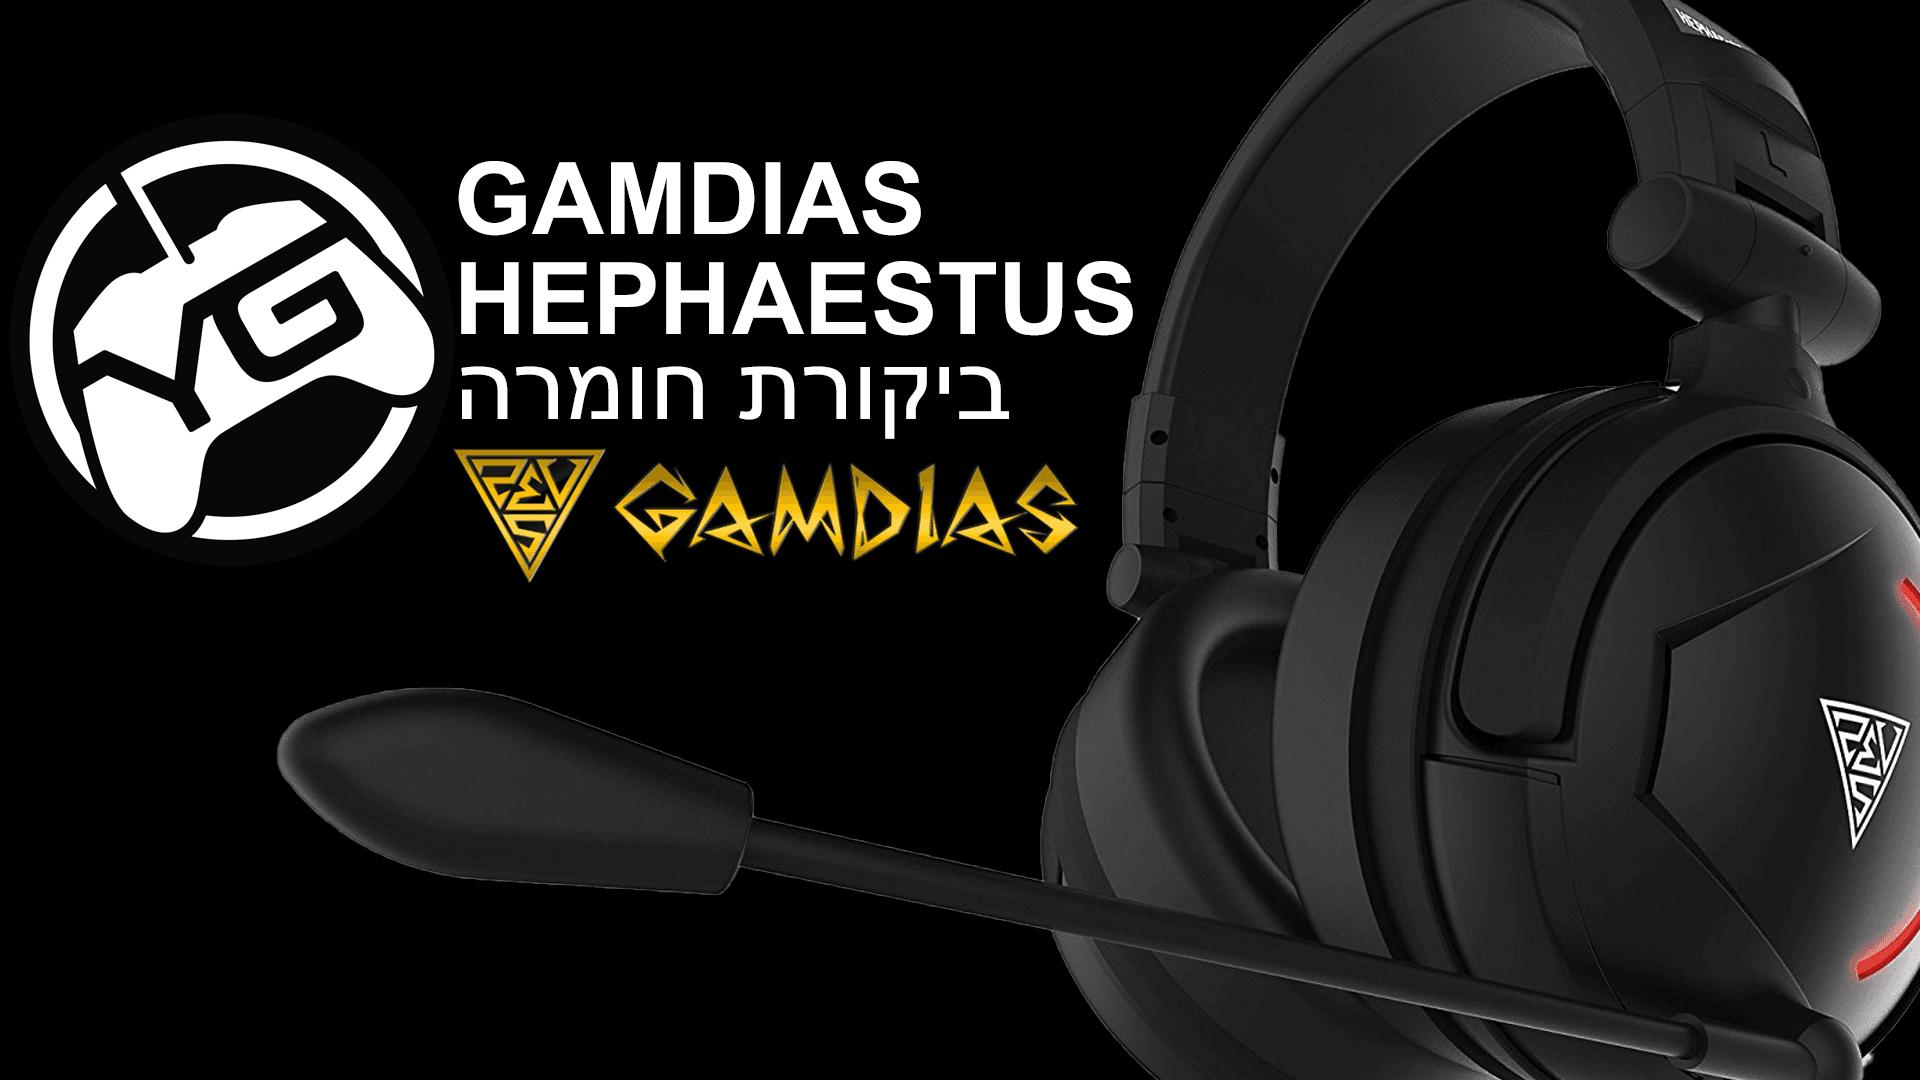 record: ביקורת וידאו: אוזניות Gamdias Hephaestus P1 RGB cover image